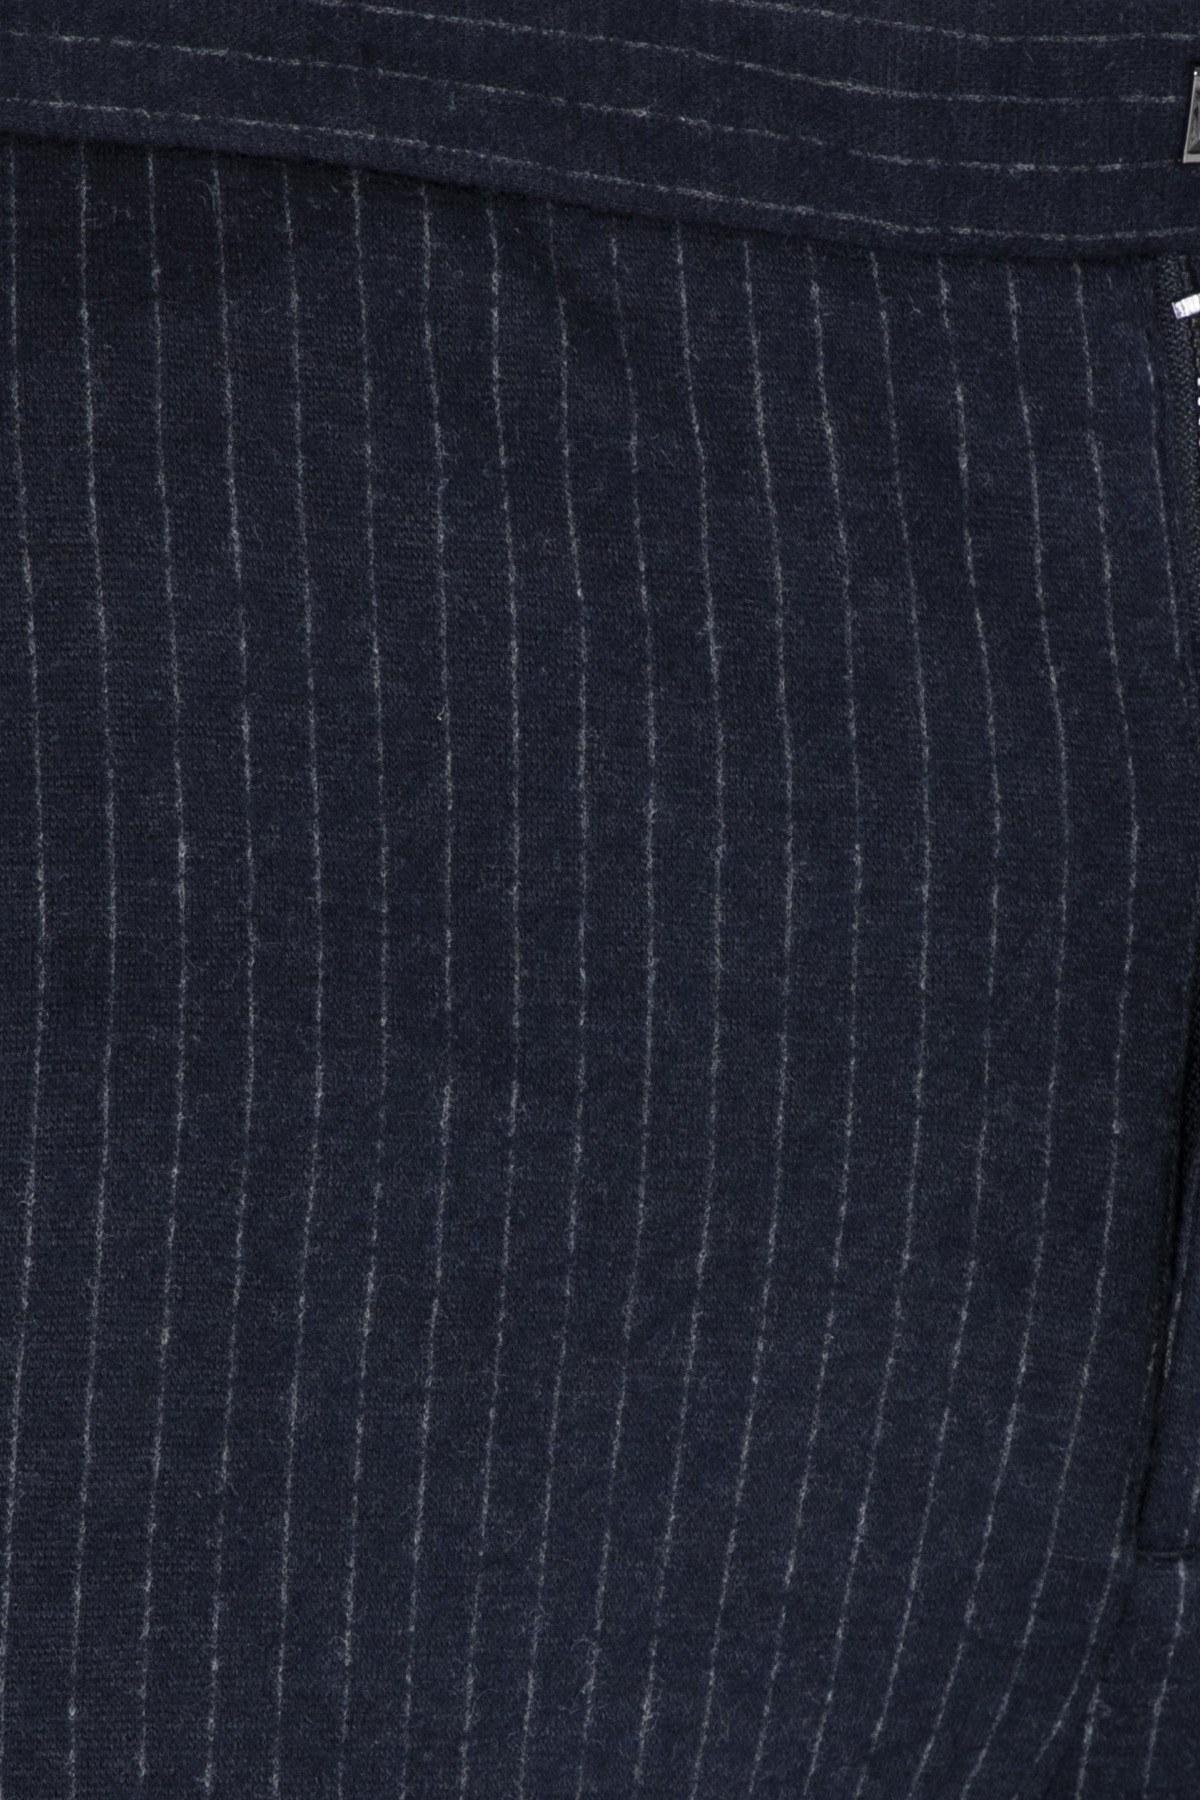 EMPORIO ARMANI Erkek Pantolon 6Z1PP3 1JTQZ F956 LACİVERT